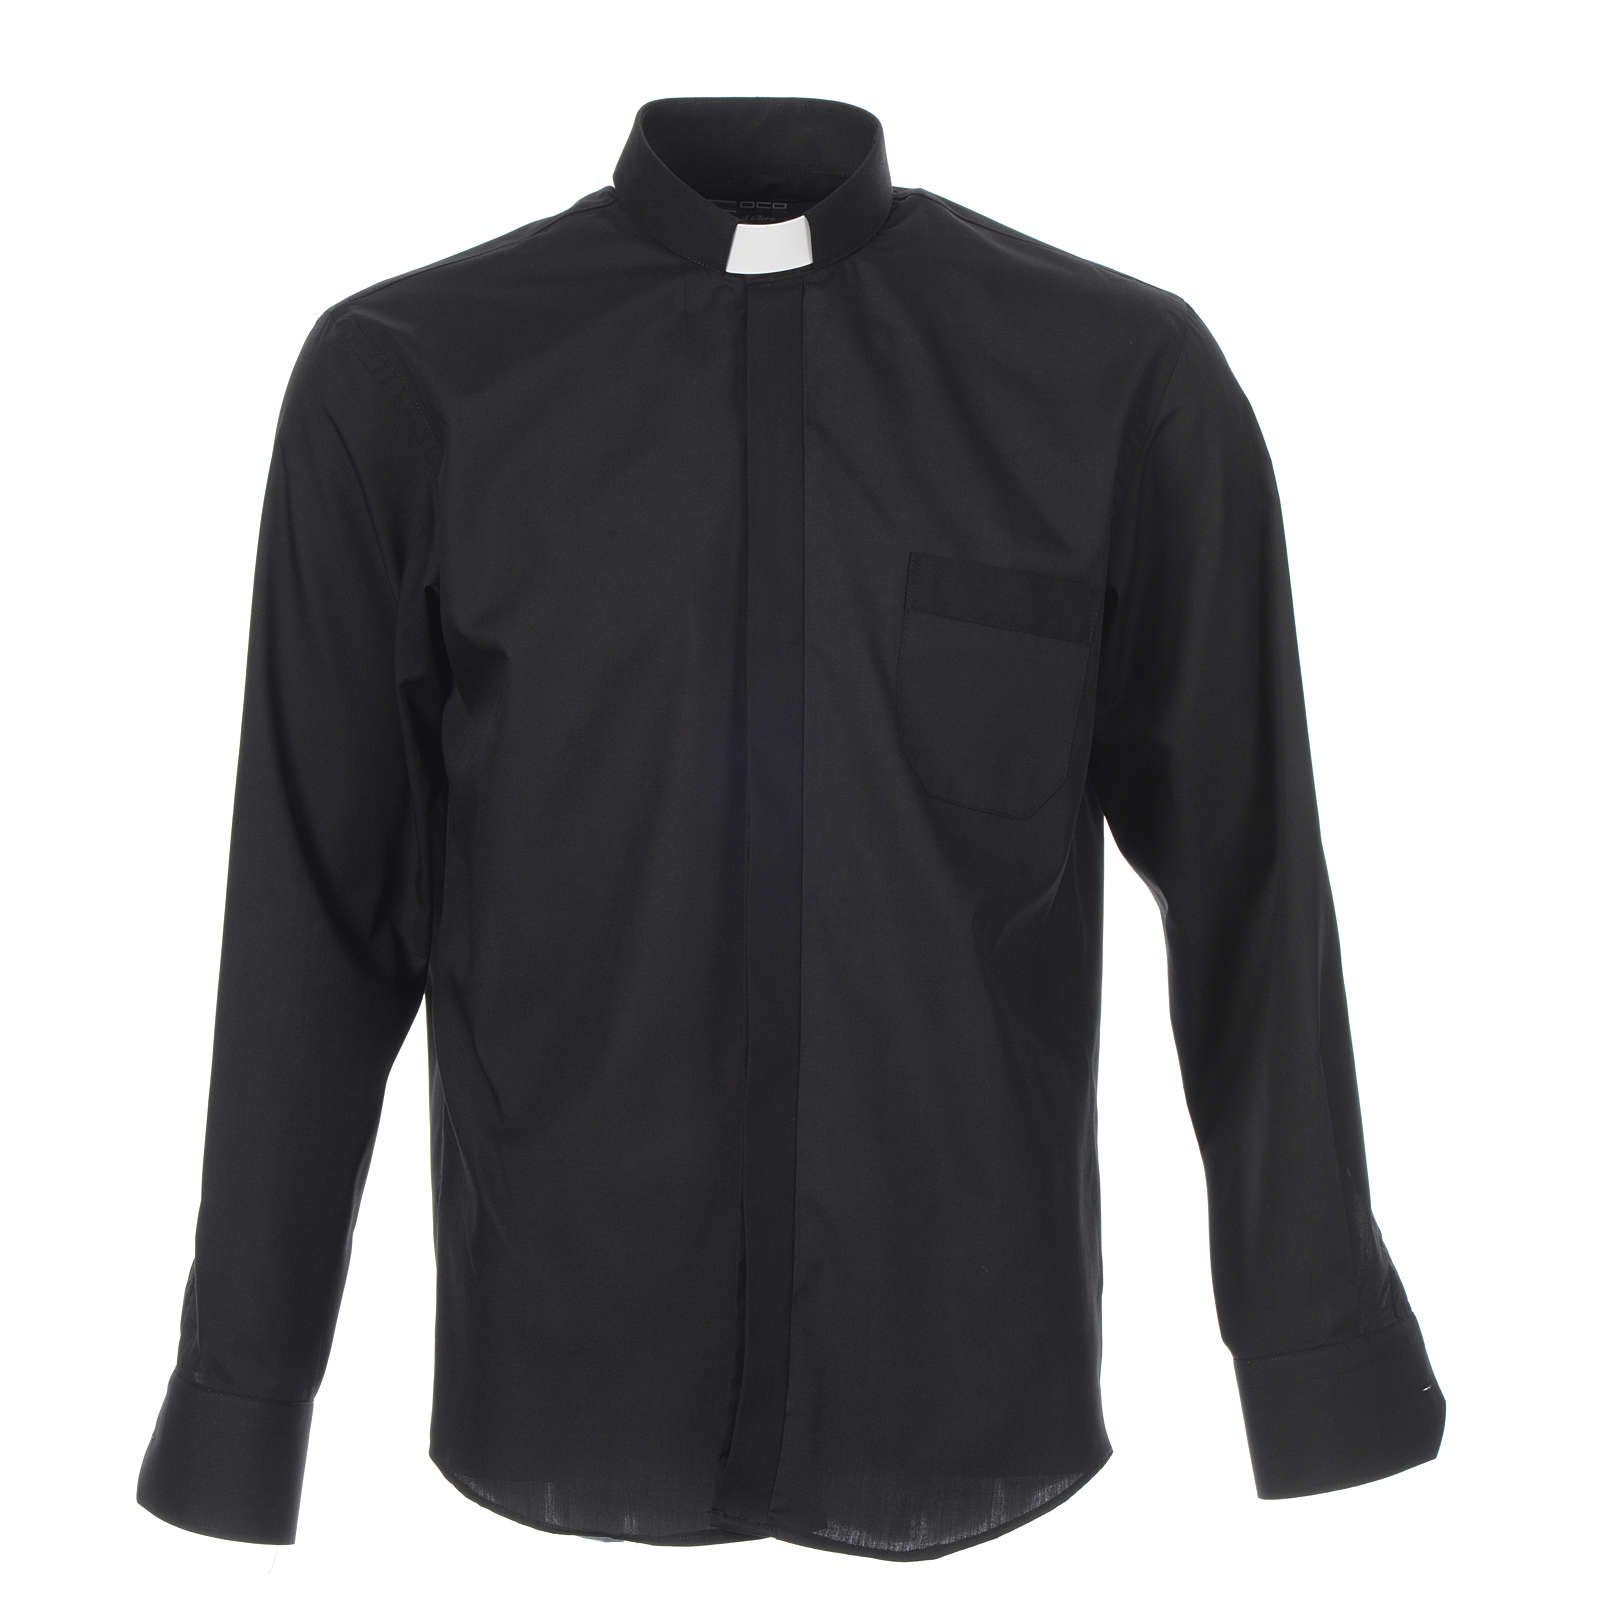 Camicia clergy tinta unita e diagonale nero manica lunga 4